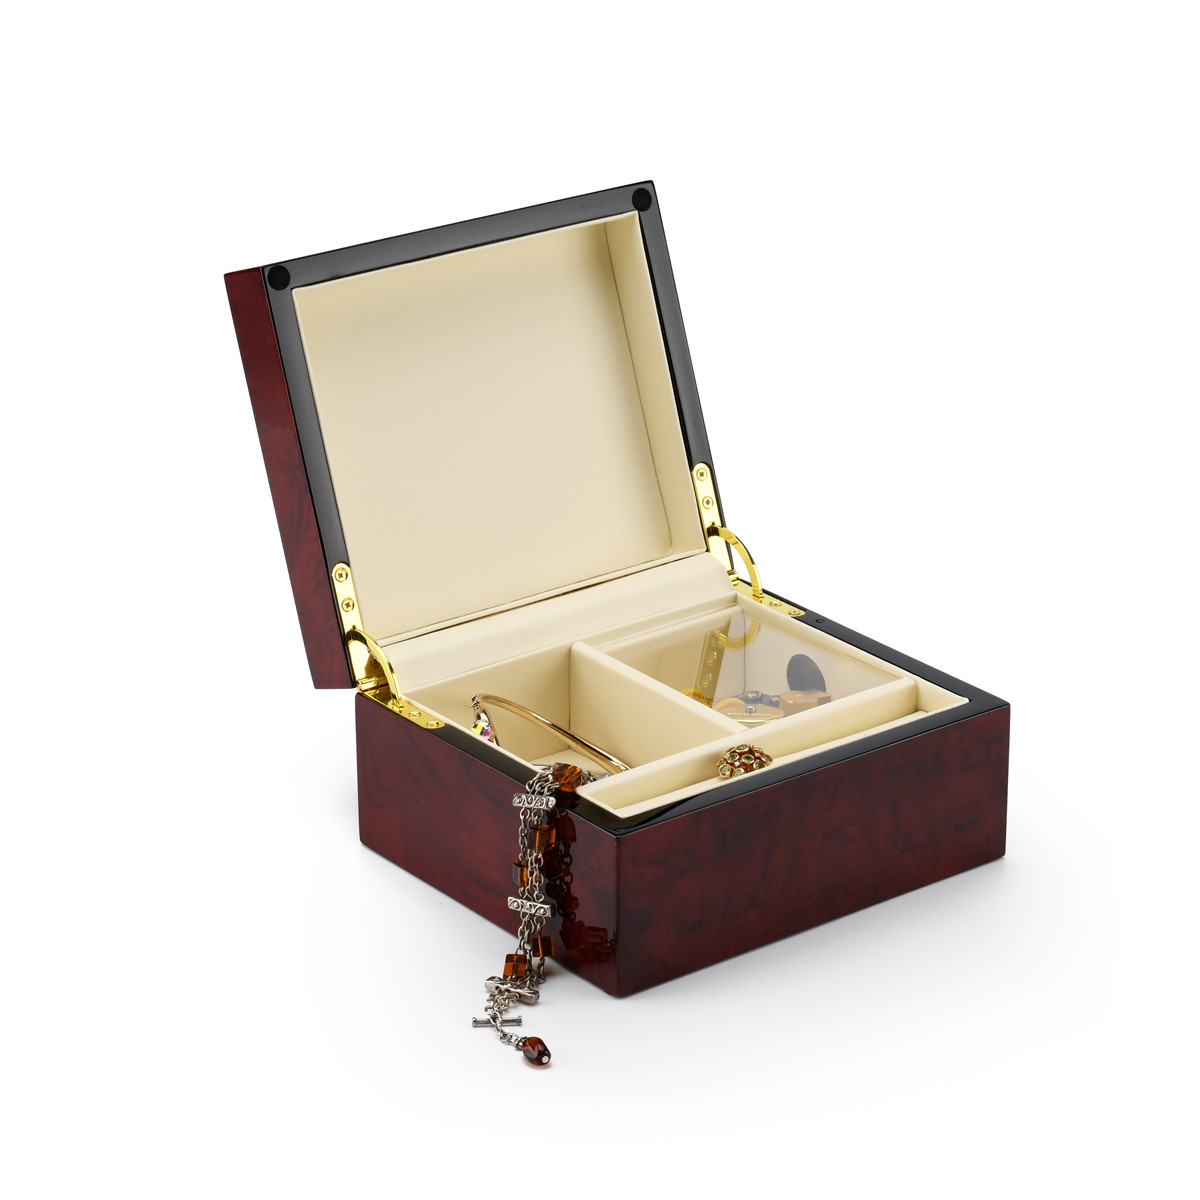 Modern Hi Gloss Burl Wood 3.6 LCD Video Jewelry Box